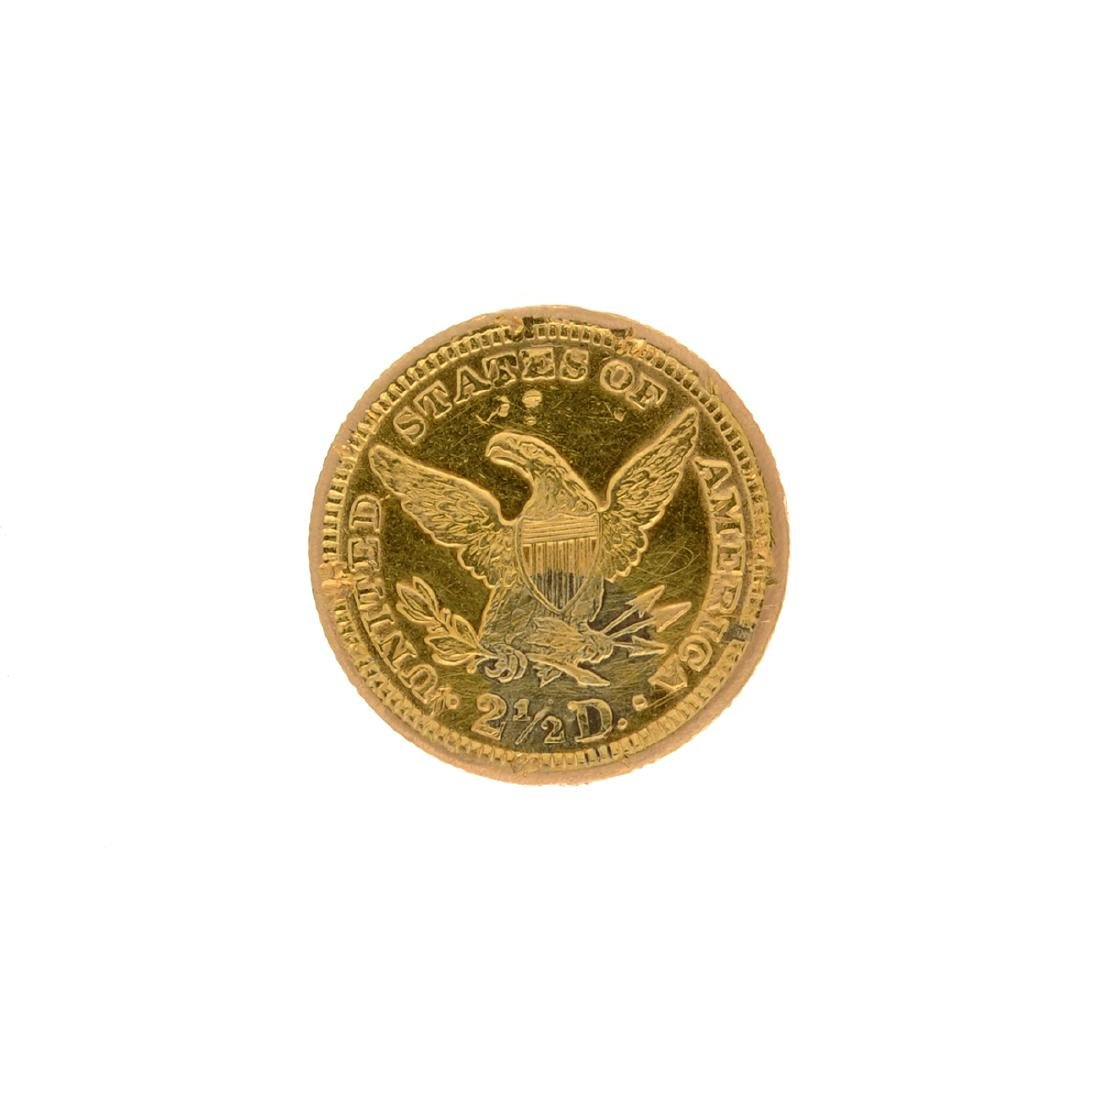 1903 $2.50 U.S. Liberty Head Gold Coin - 2